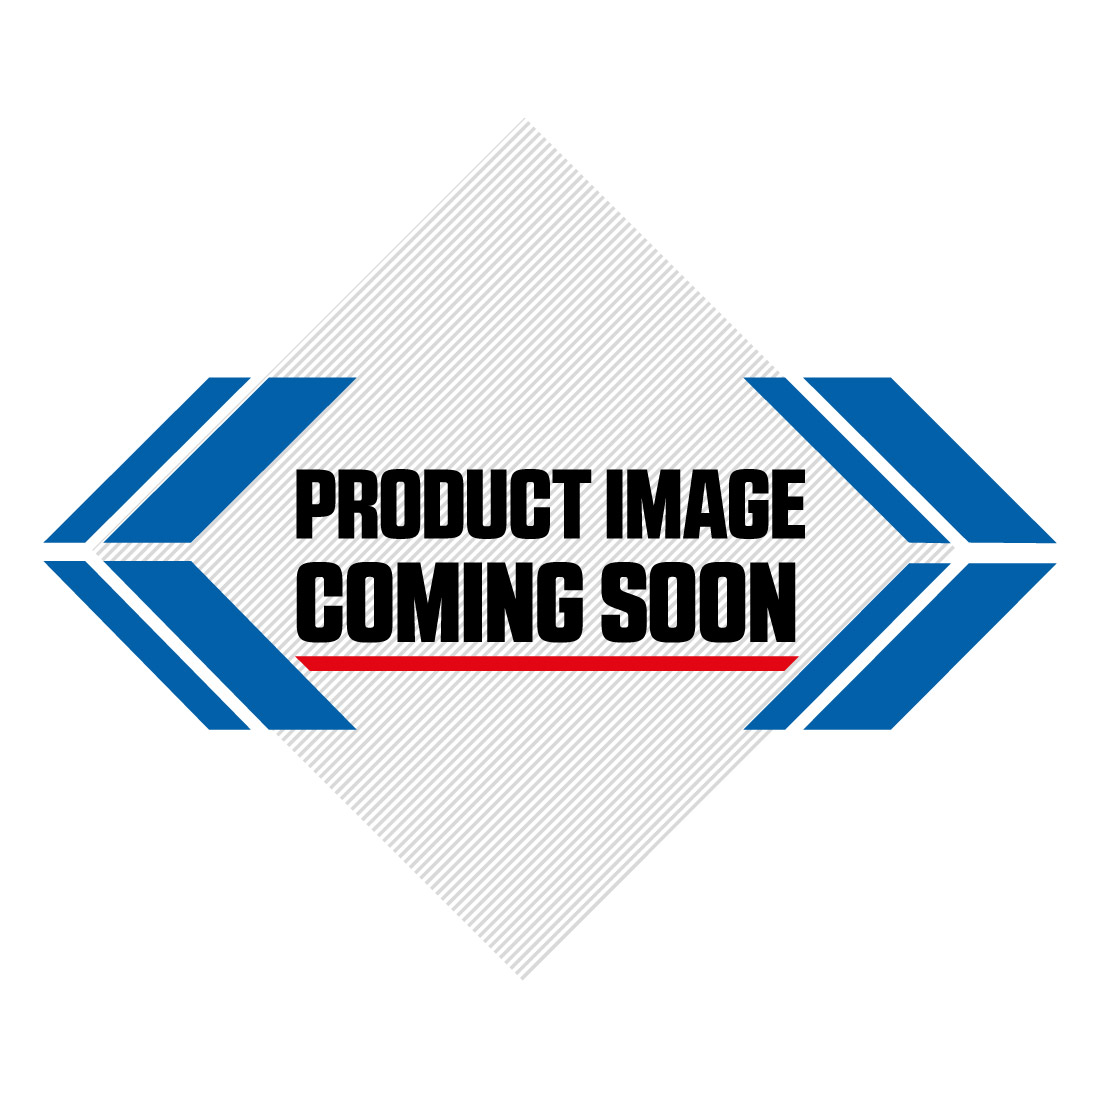 UFO Honda EVO Plastic Kit CR 500 (91-94) OEM Factory Image-2>